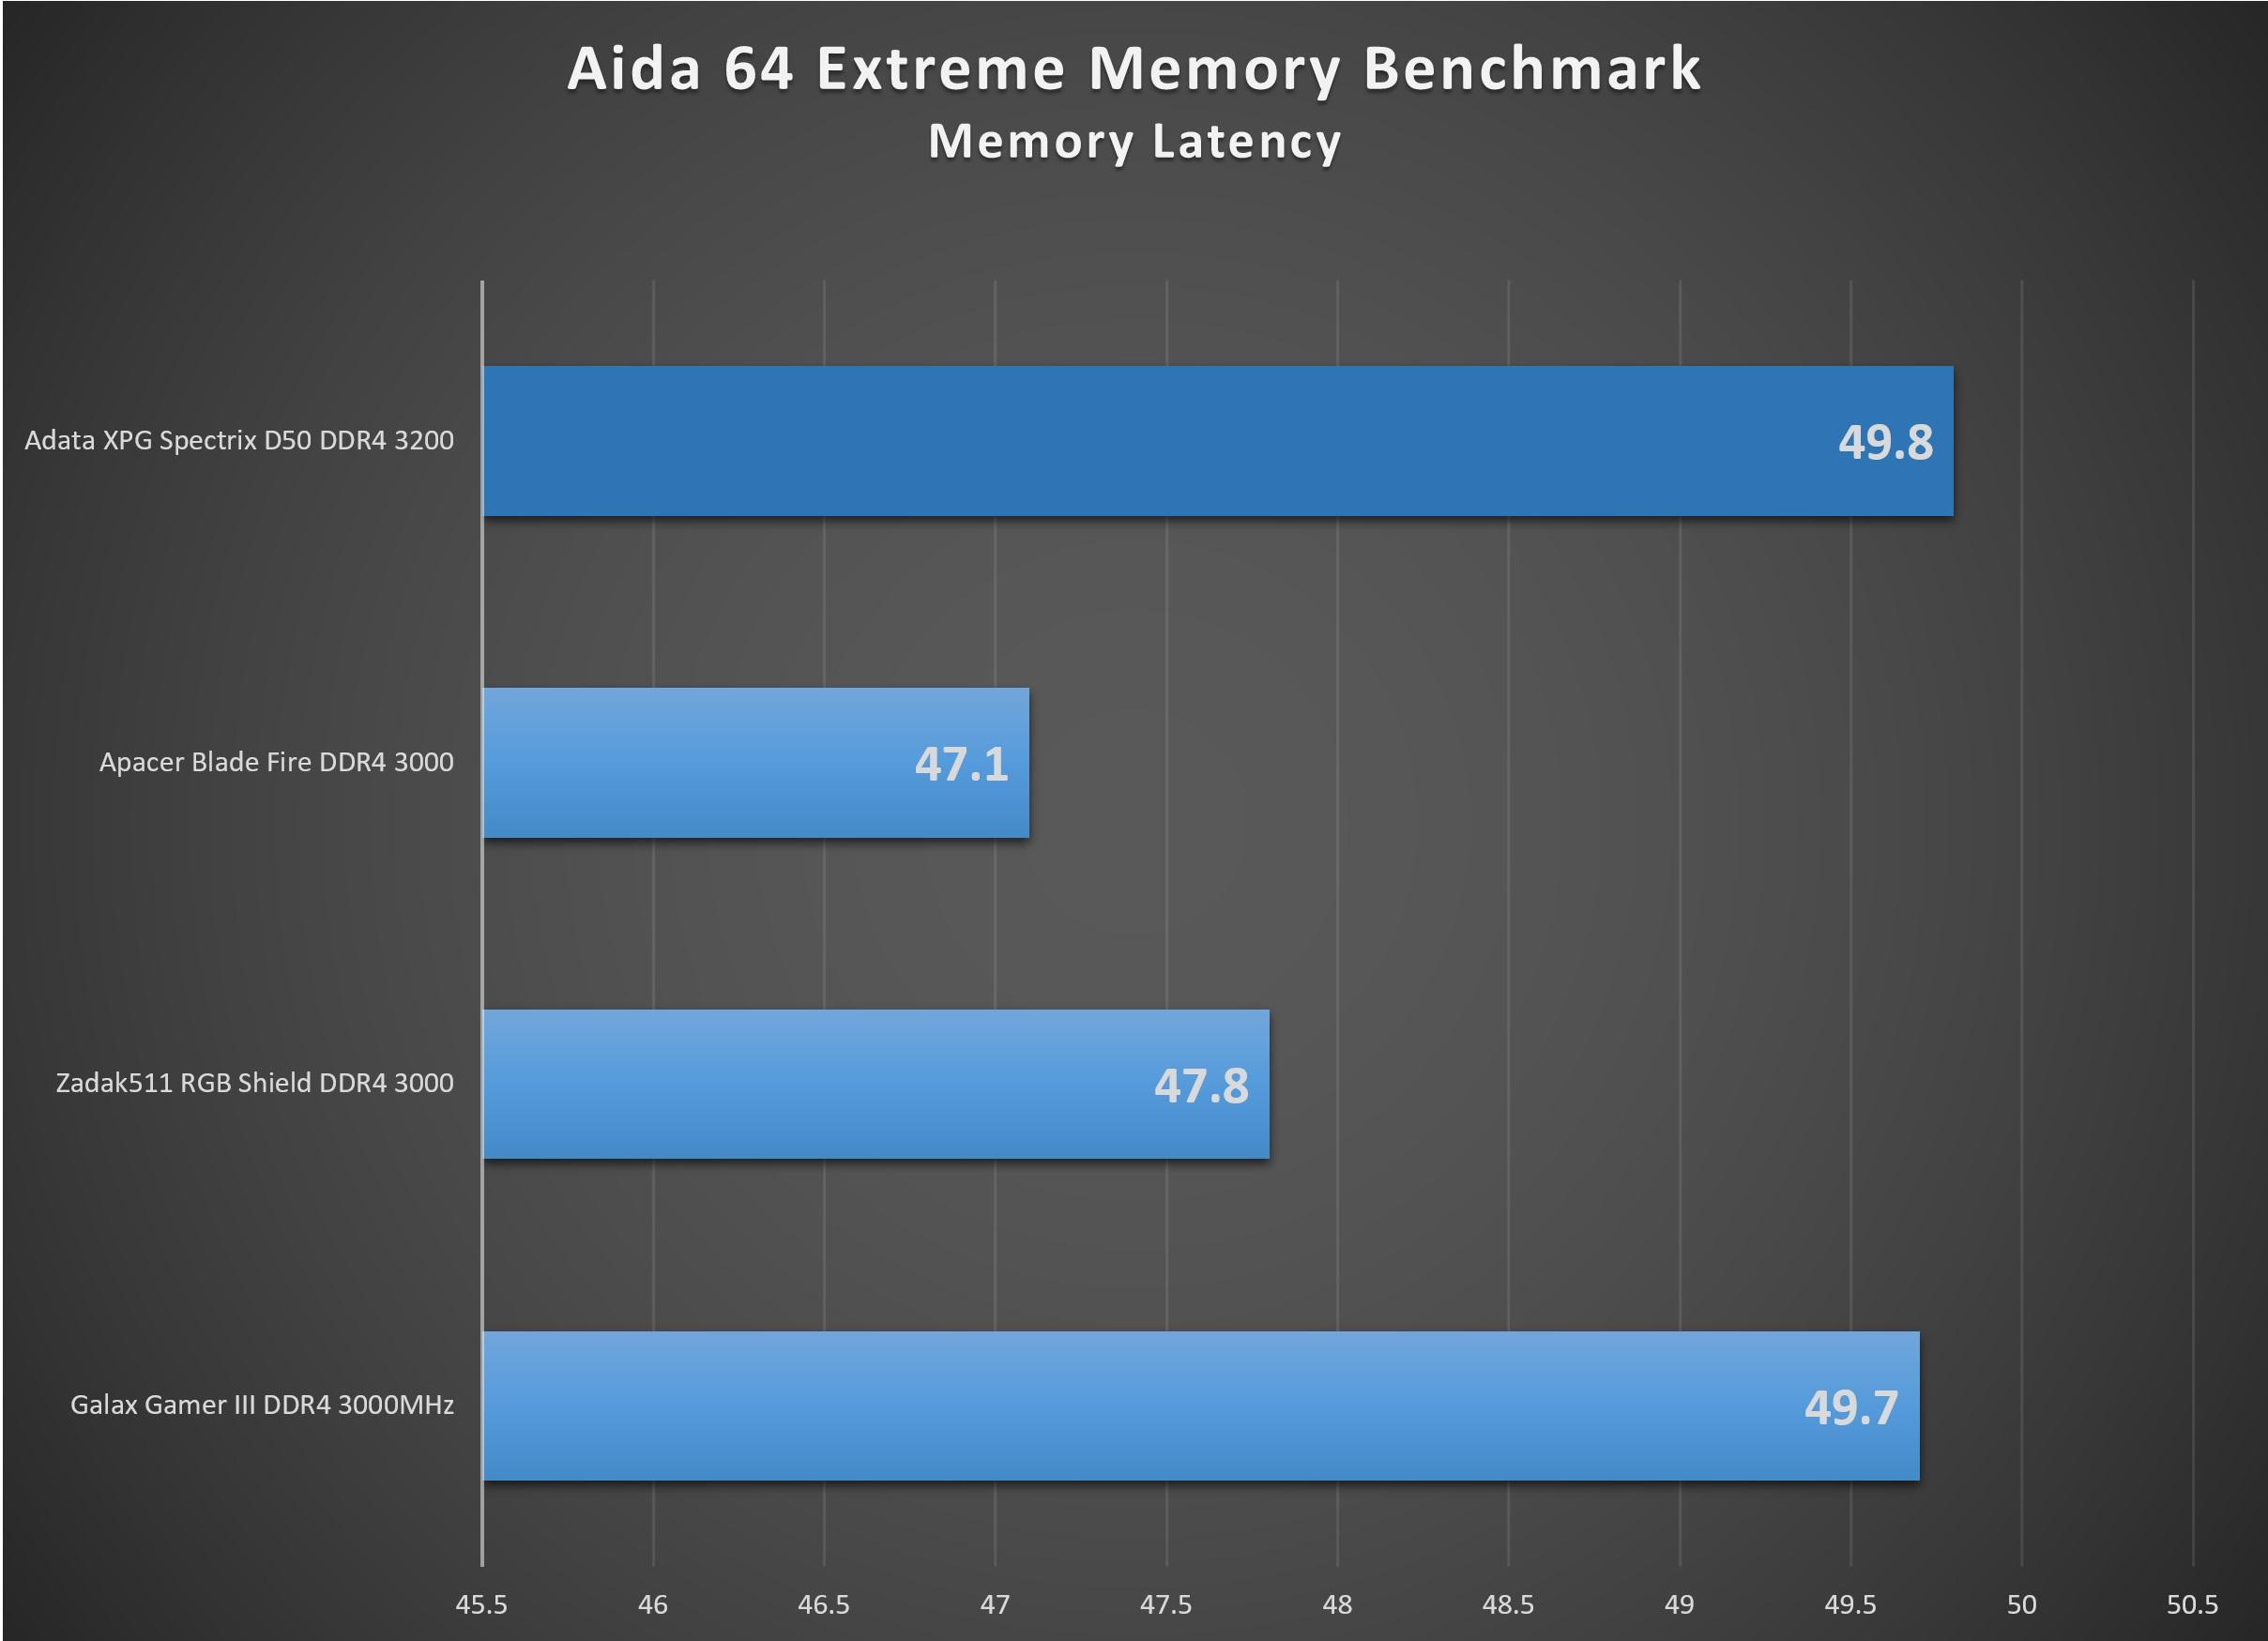 XPG_Spectrix_D50_3200-aida64_memorylatency